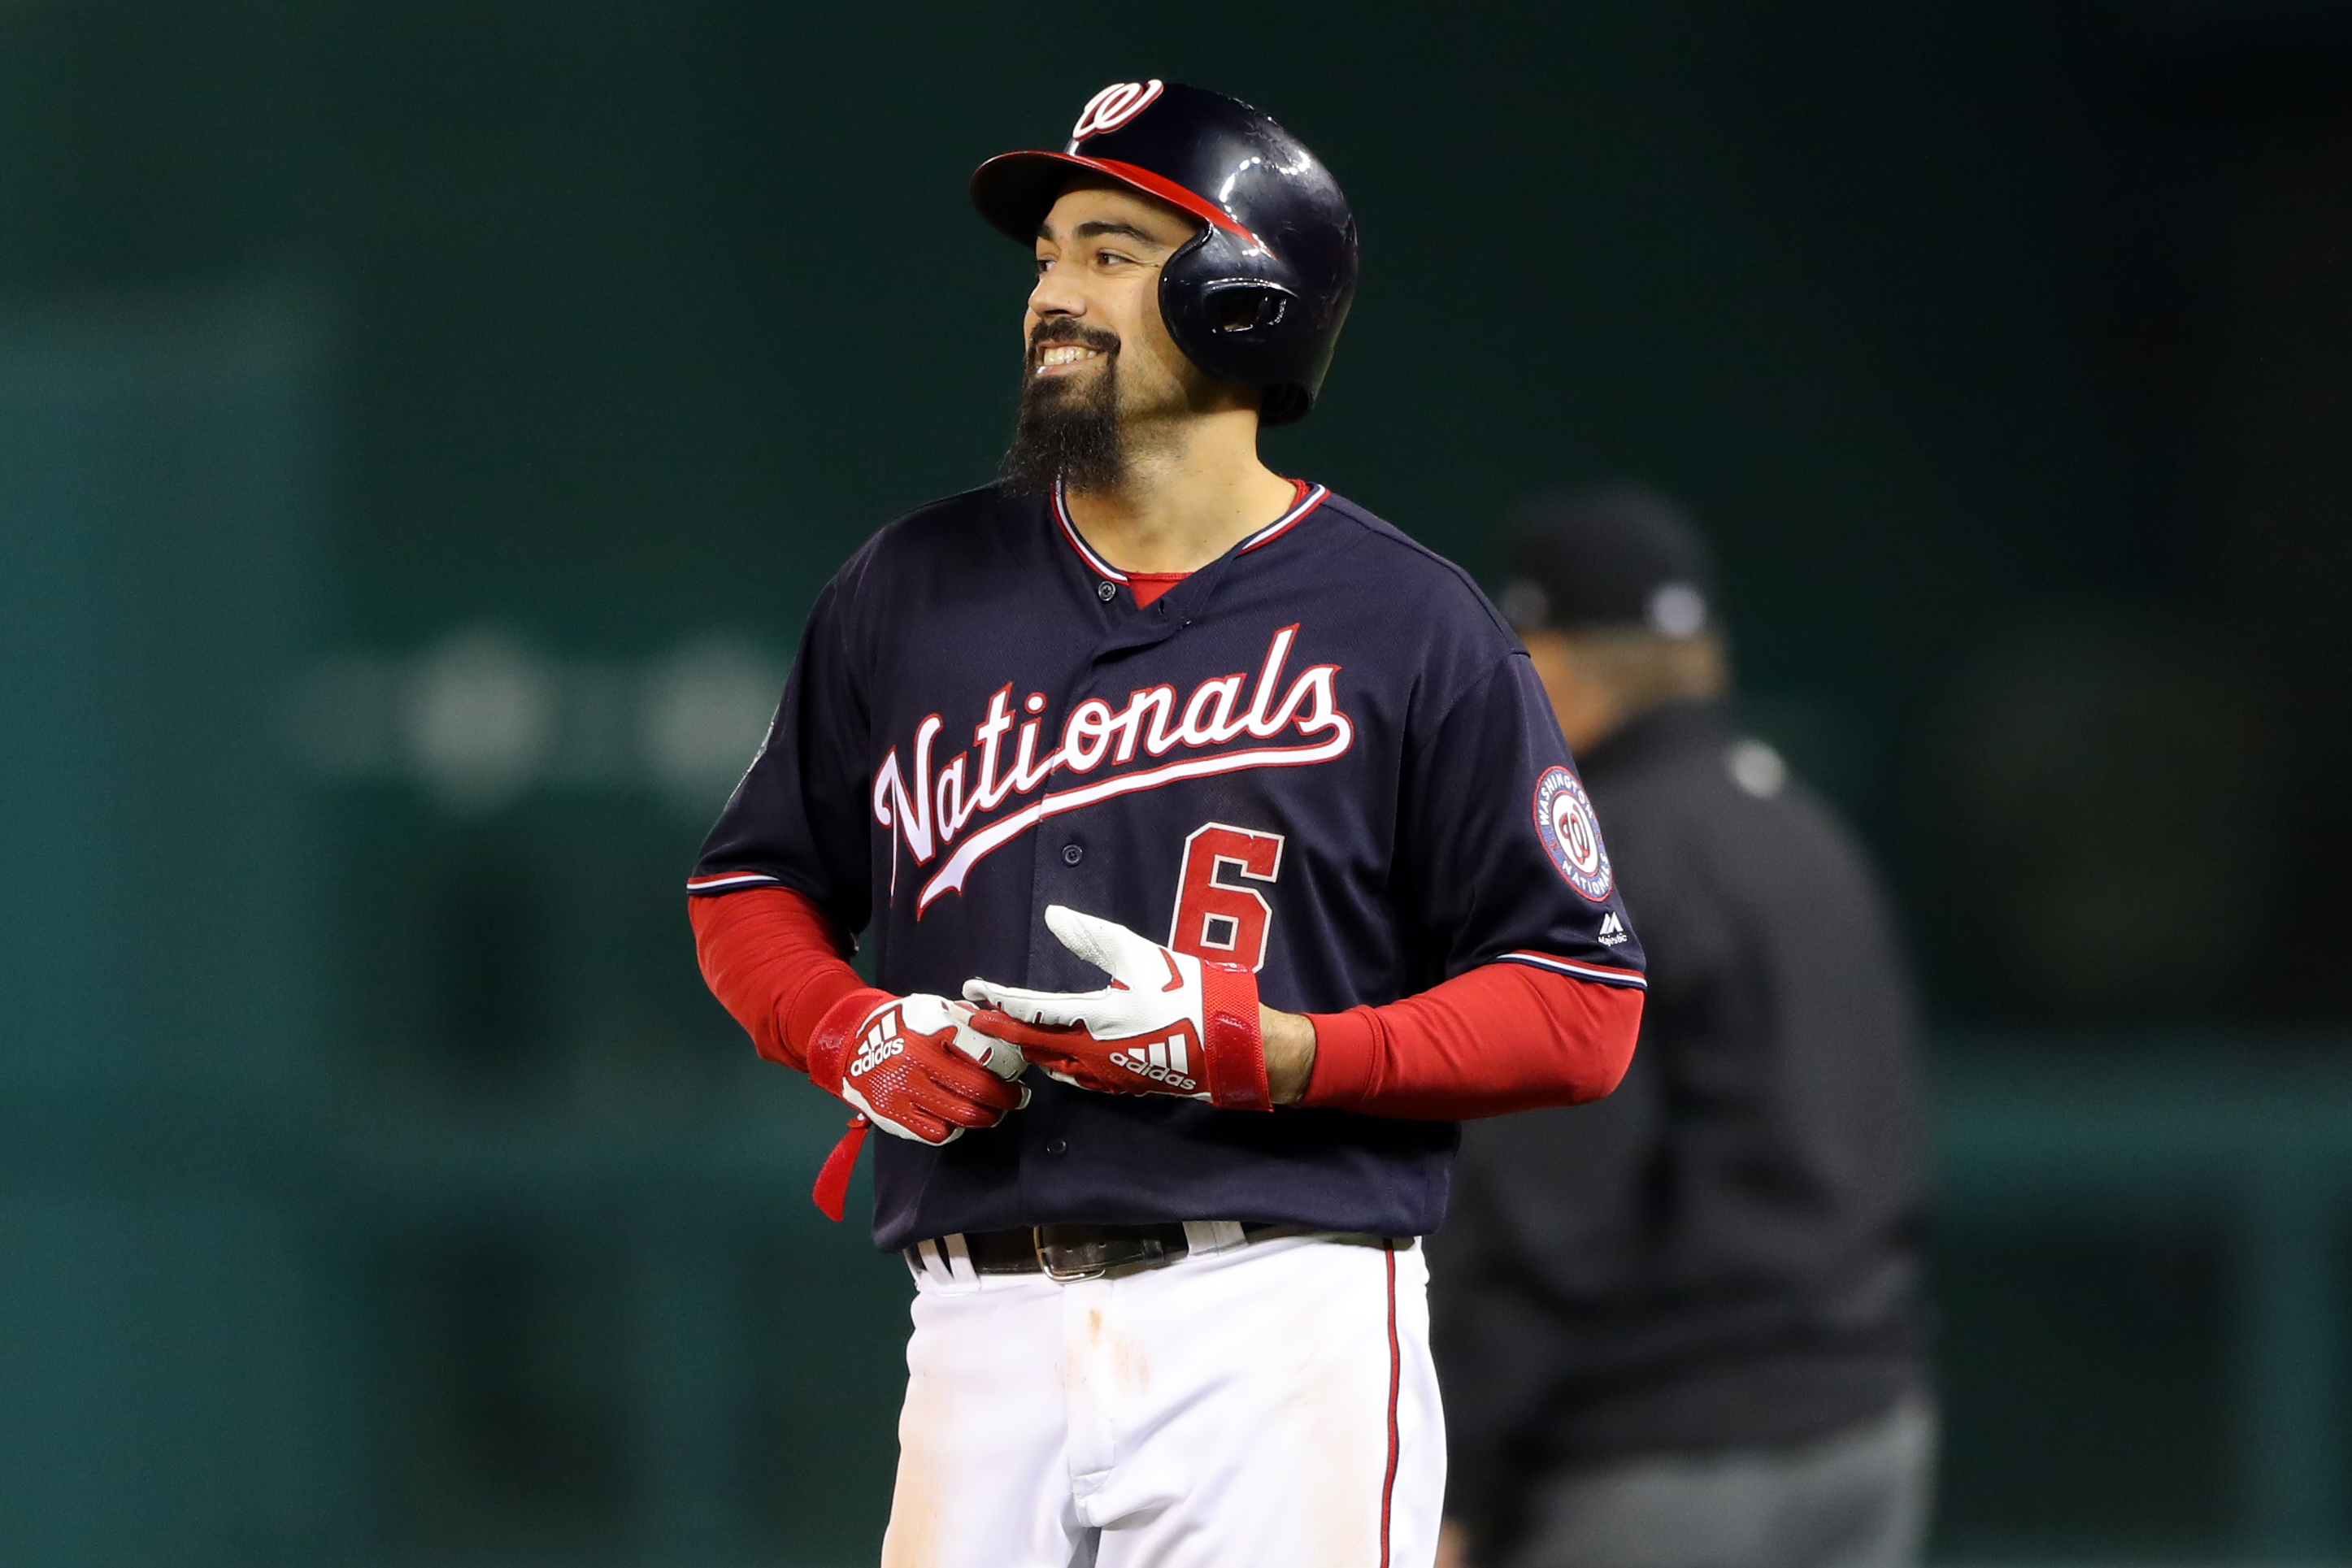 2019 World Series Game 4 - Houston Astros v. Washington Nationals